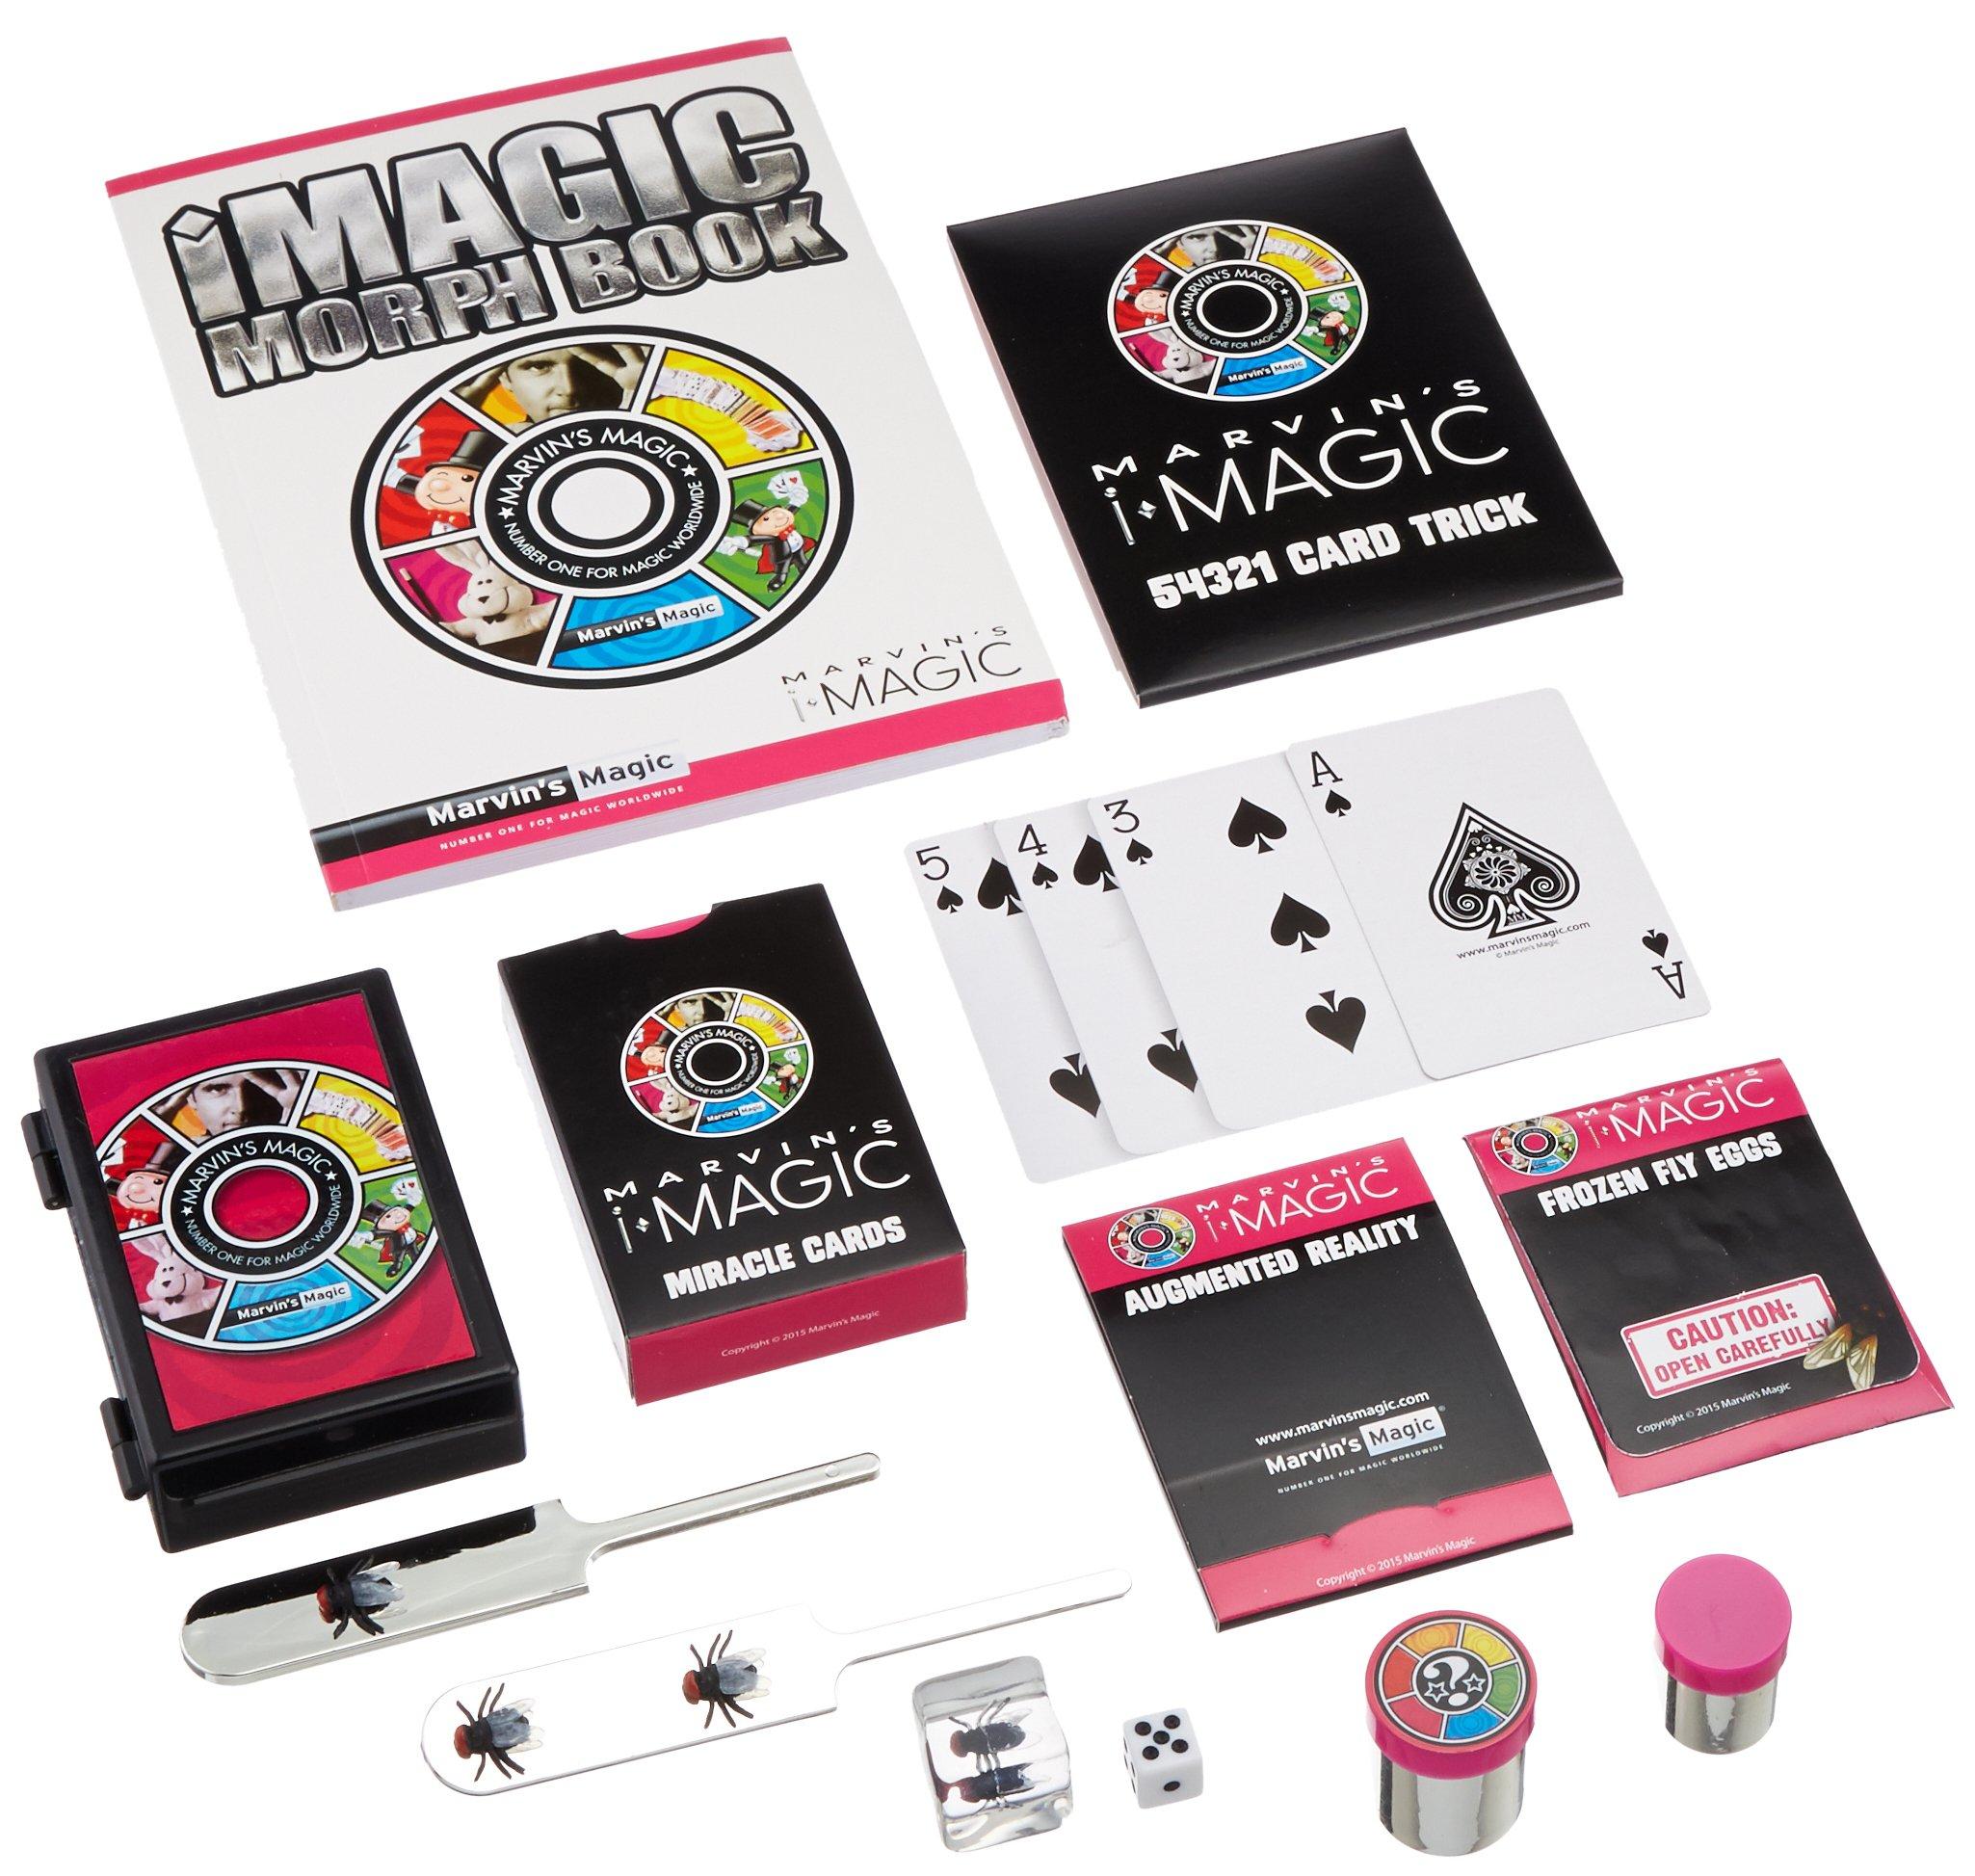 Marvin's iMagic Interactive Box of Tricks Set - Amazing